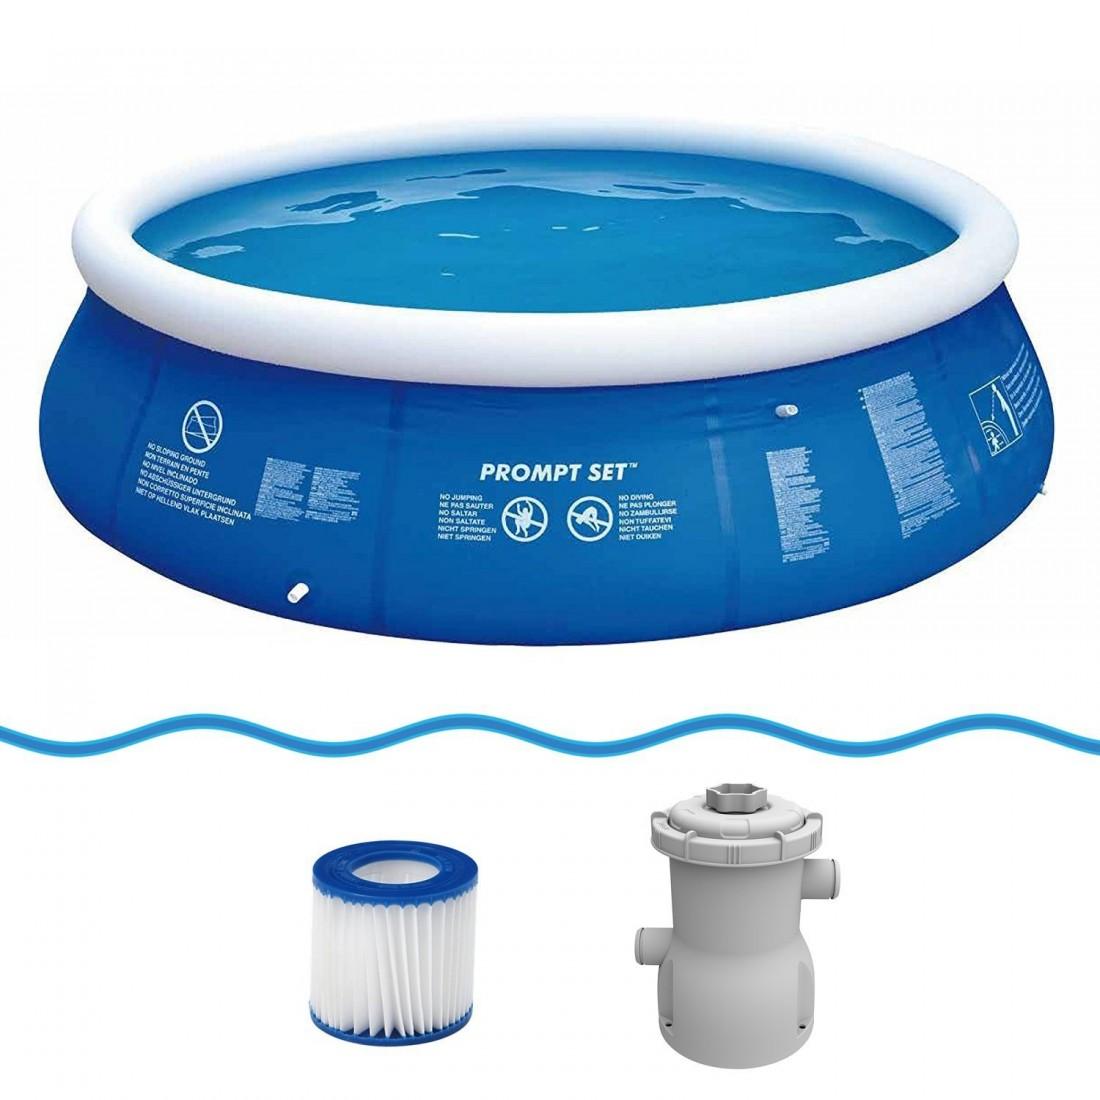 Buy jilong prompt set blue 360 set quick up pool set for Quick up pool oval